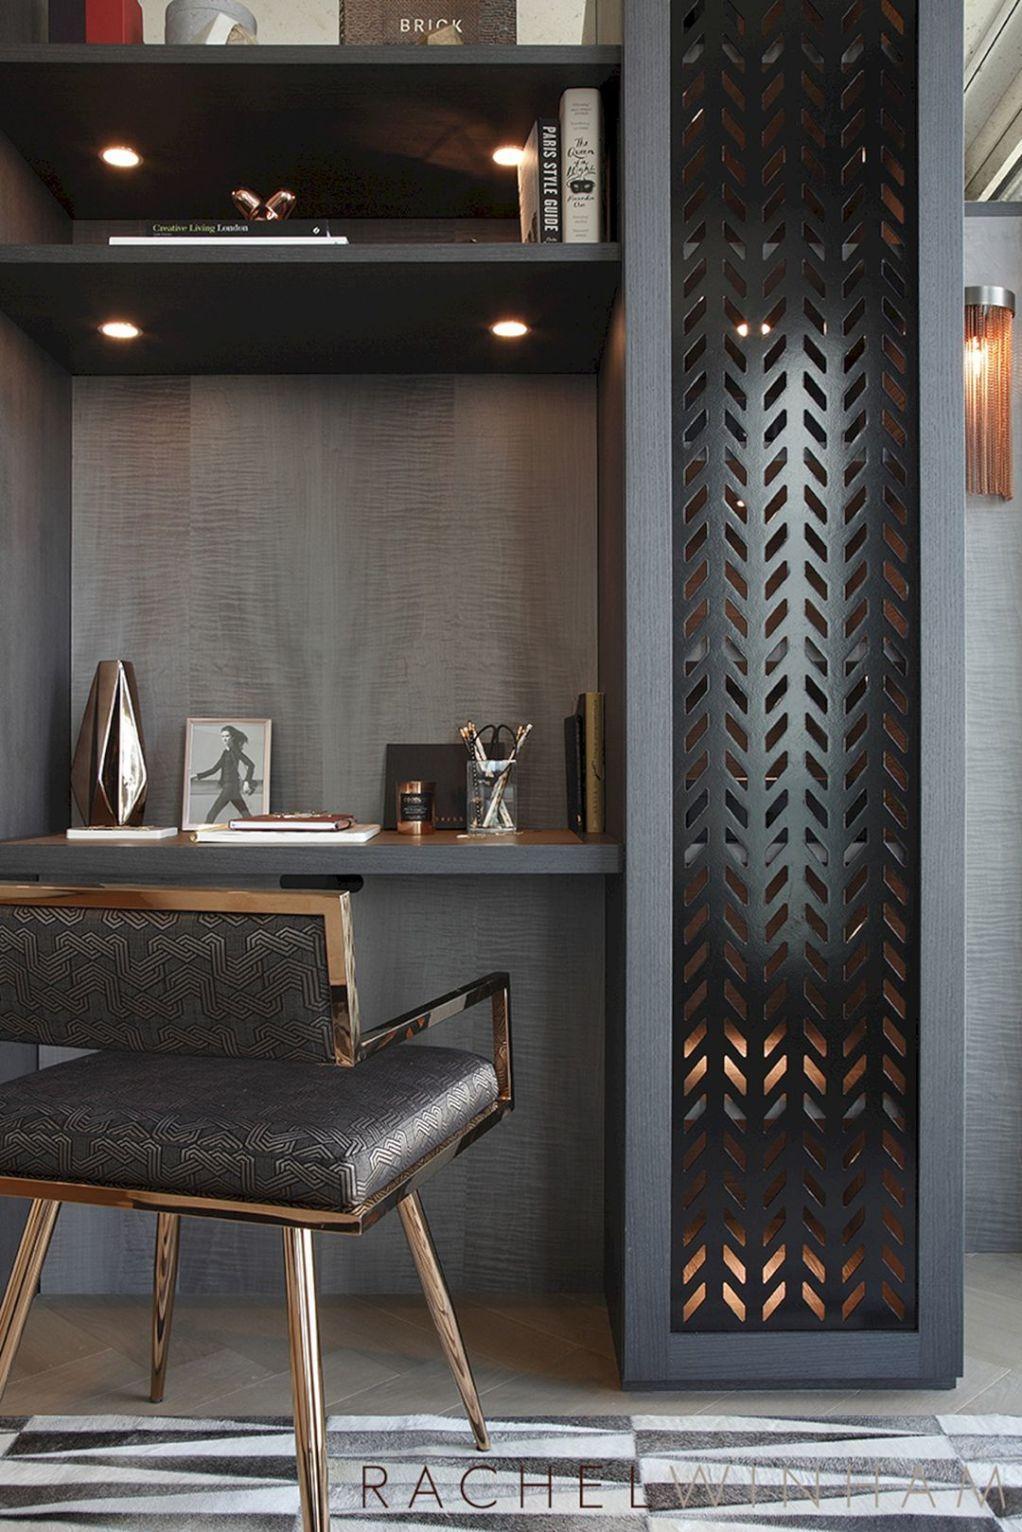 Small 10x10 Study Room Layout: Minimal Interior Design Inspiration